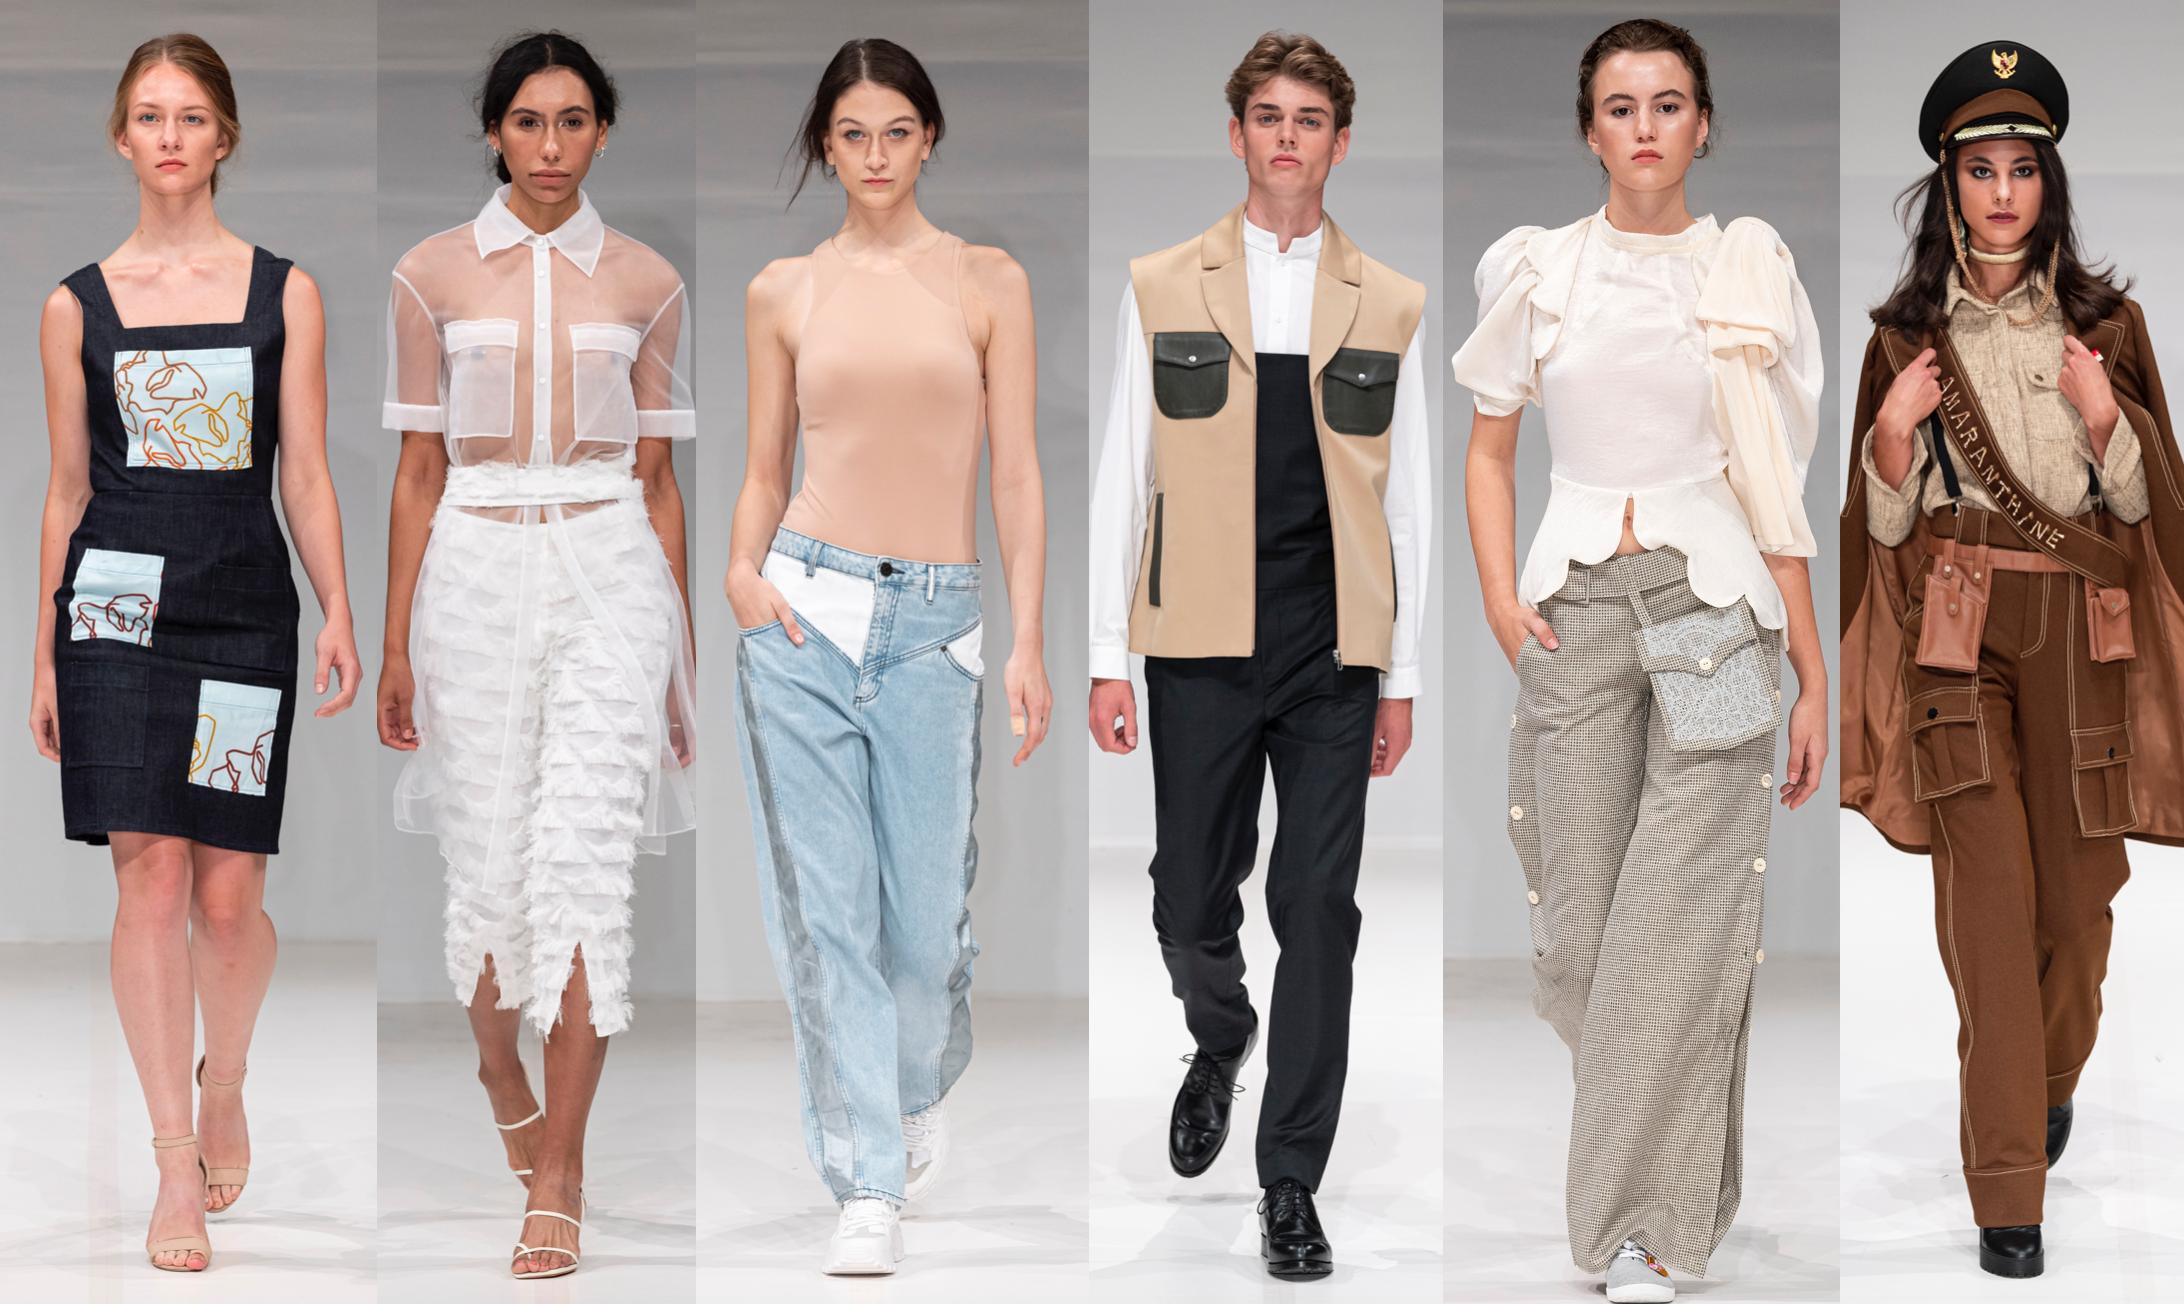 Left To Right:    Lexlo, Point Zero One, Raw Jeans, Maria Barreca, Amaranthine Atelier